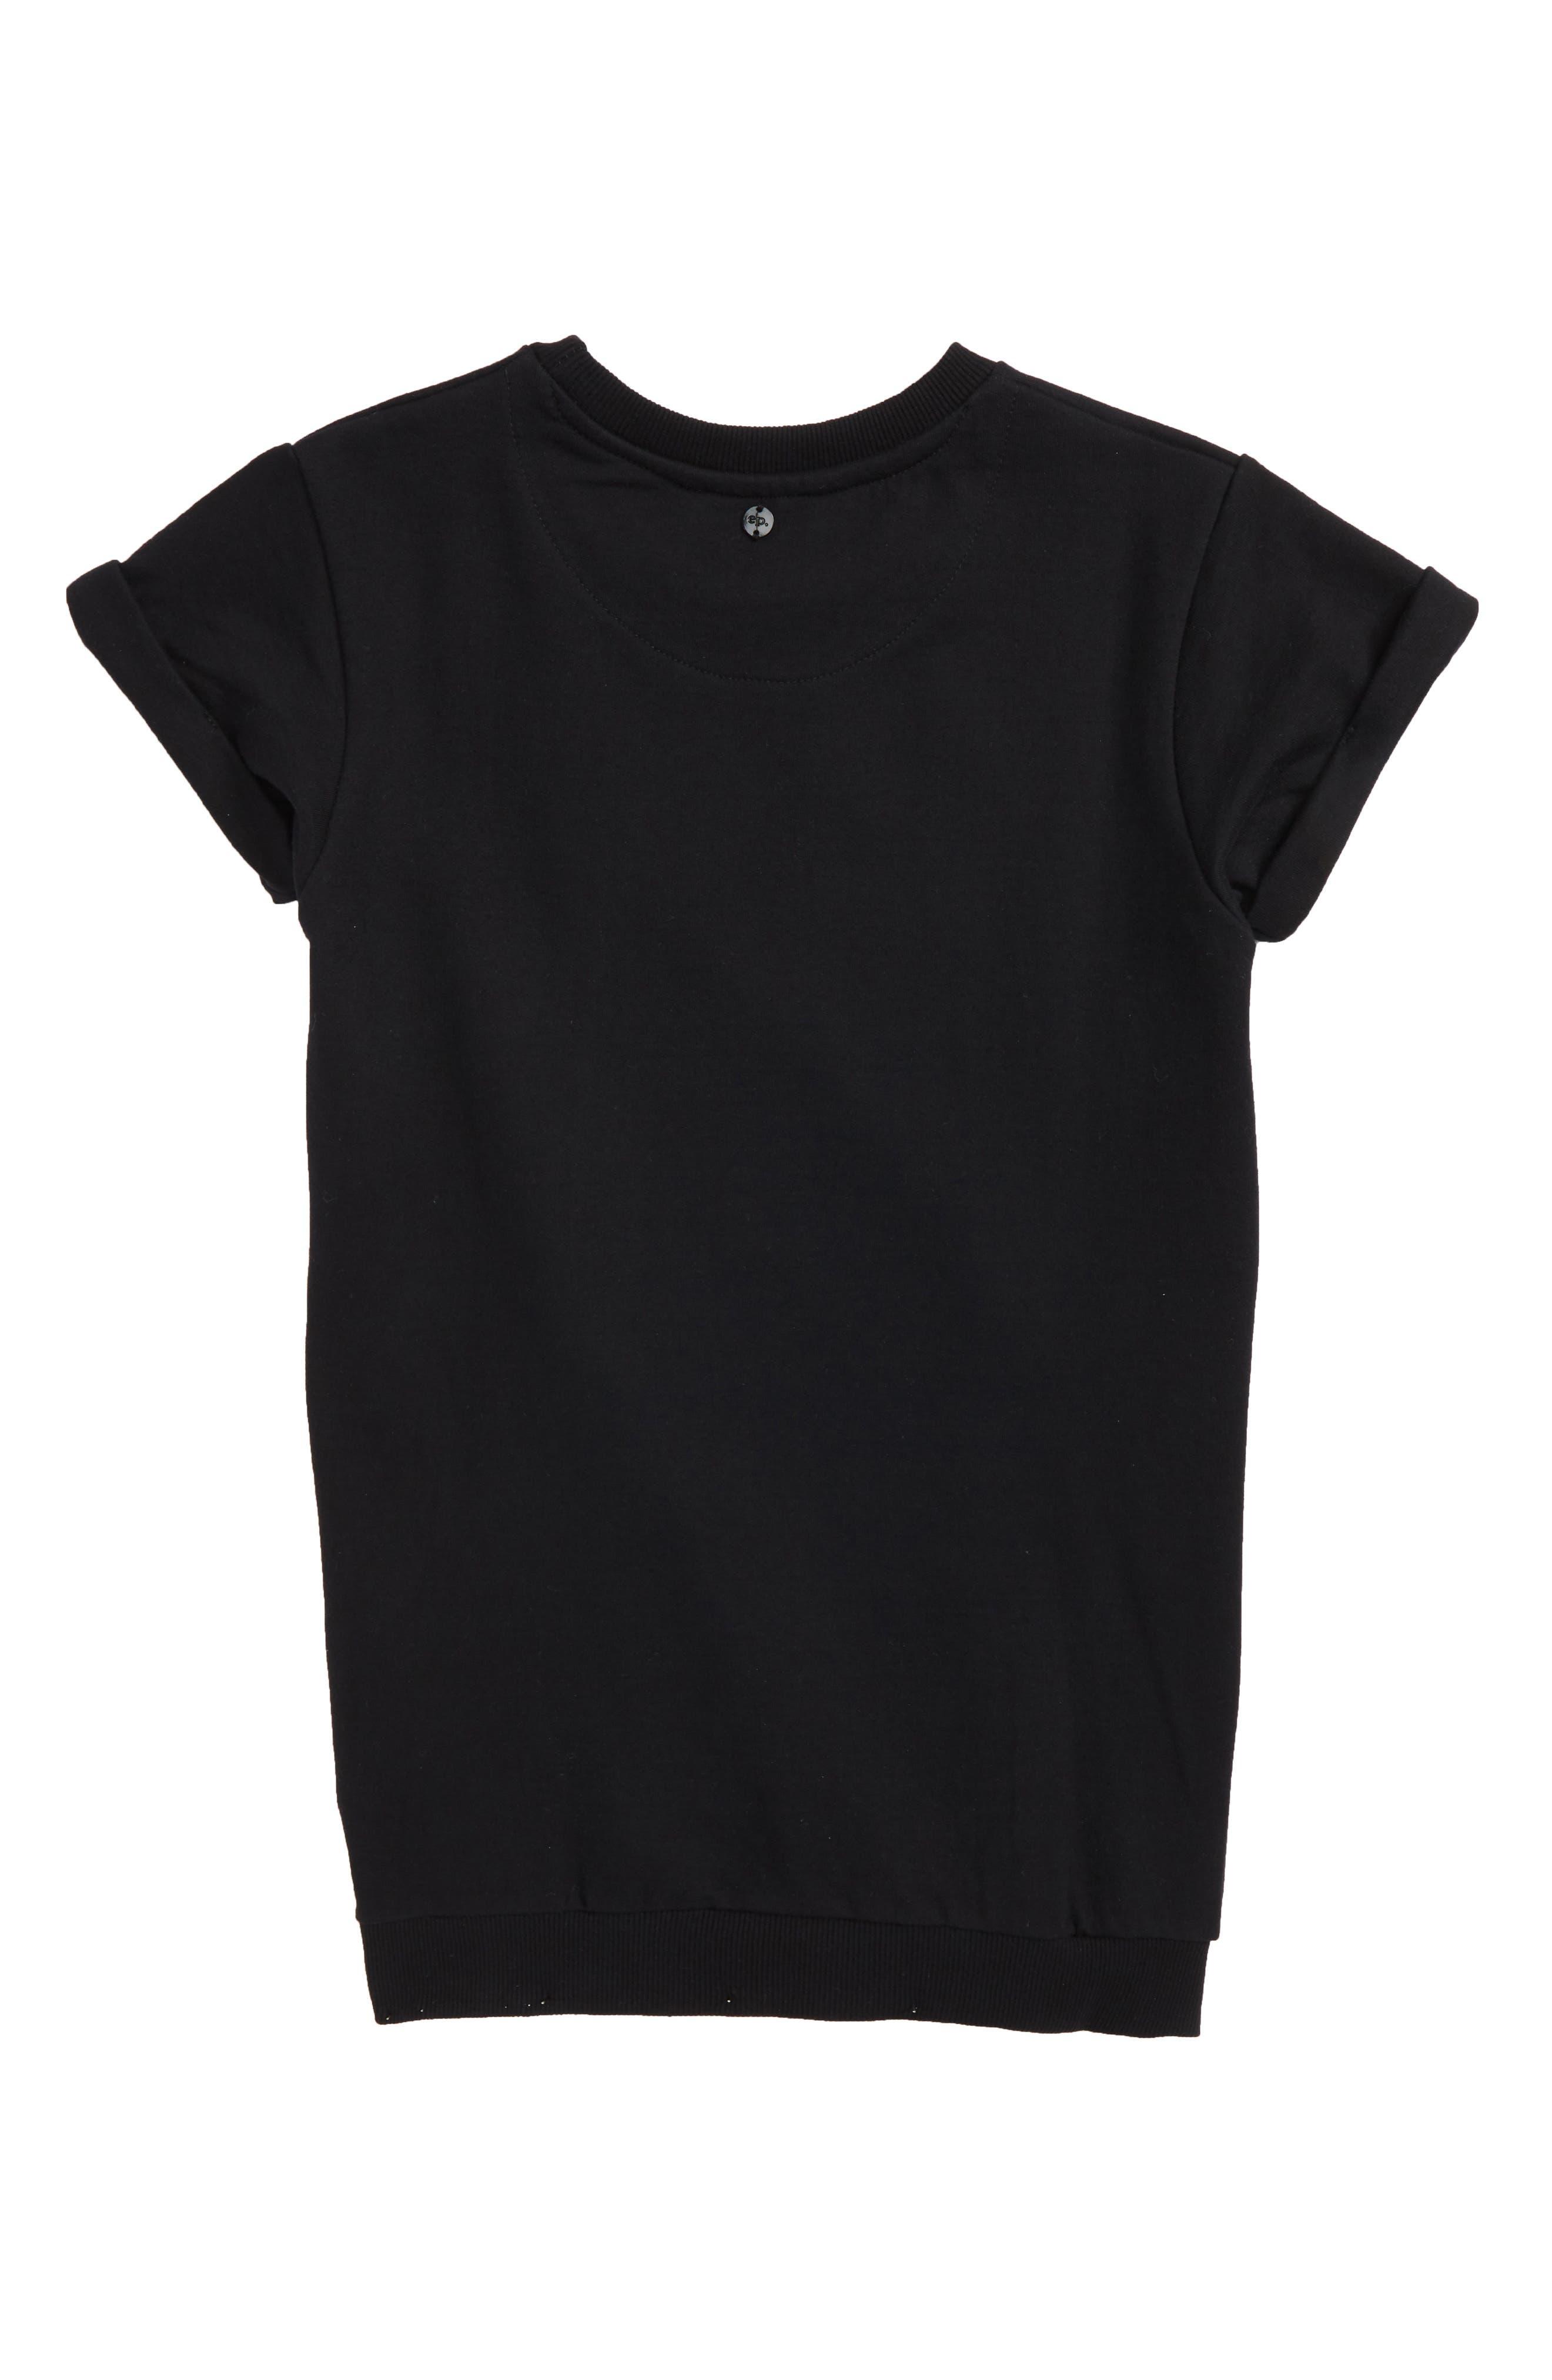 Adorn Sweatshirt Dress,                             Alternate thumbnail 2, color,                             Black